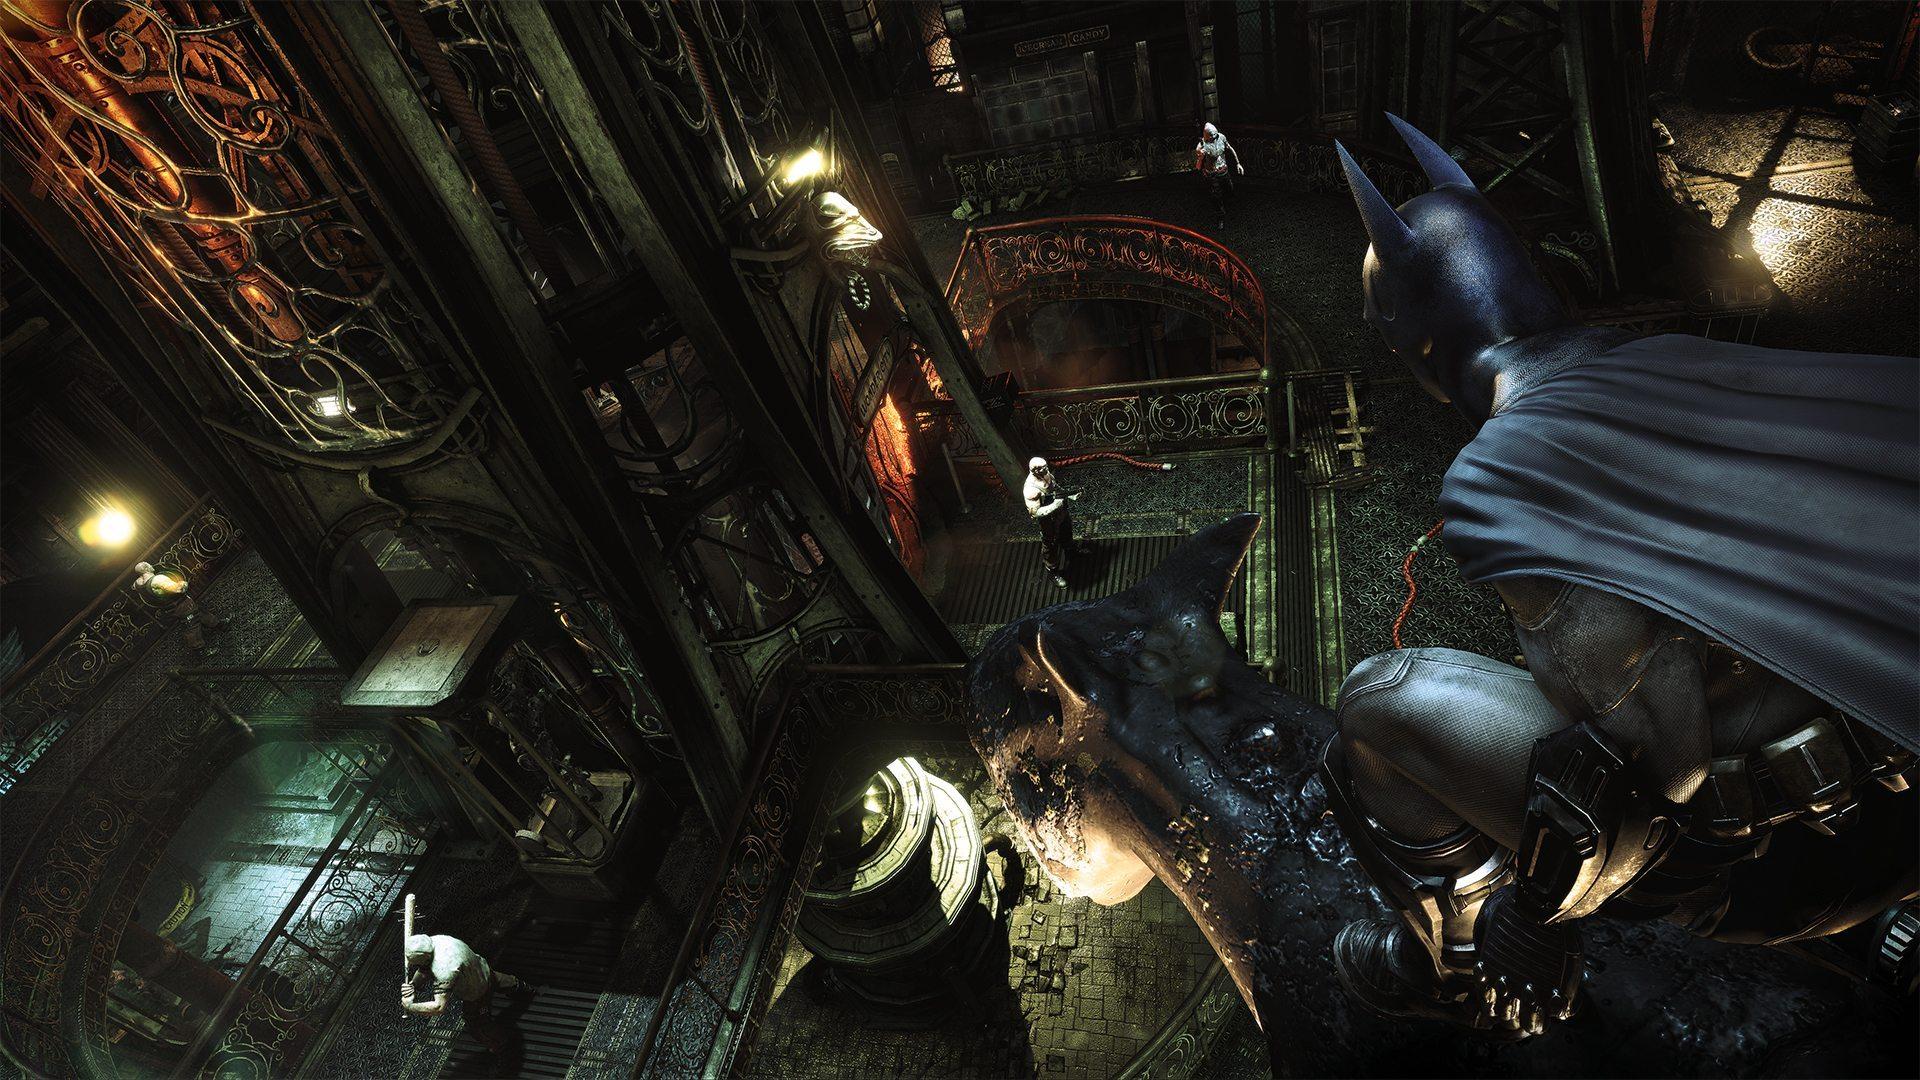 Batman: Arkham City, Batman: Return to Arkham